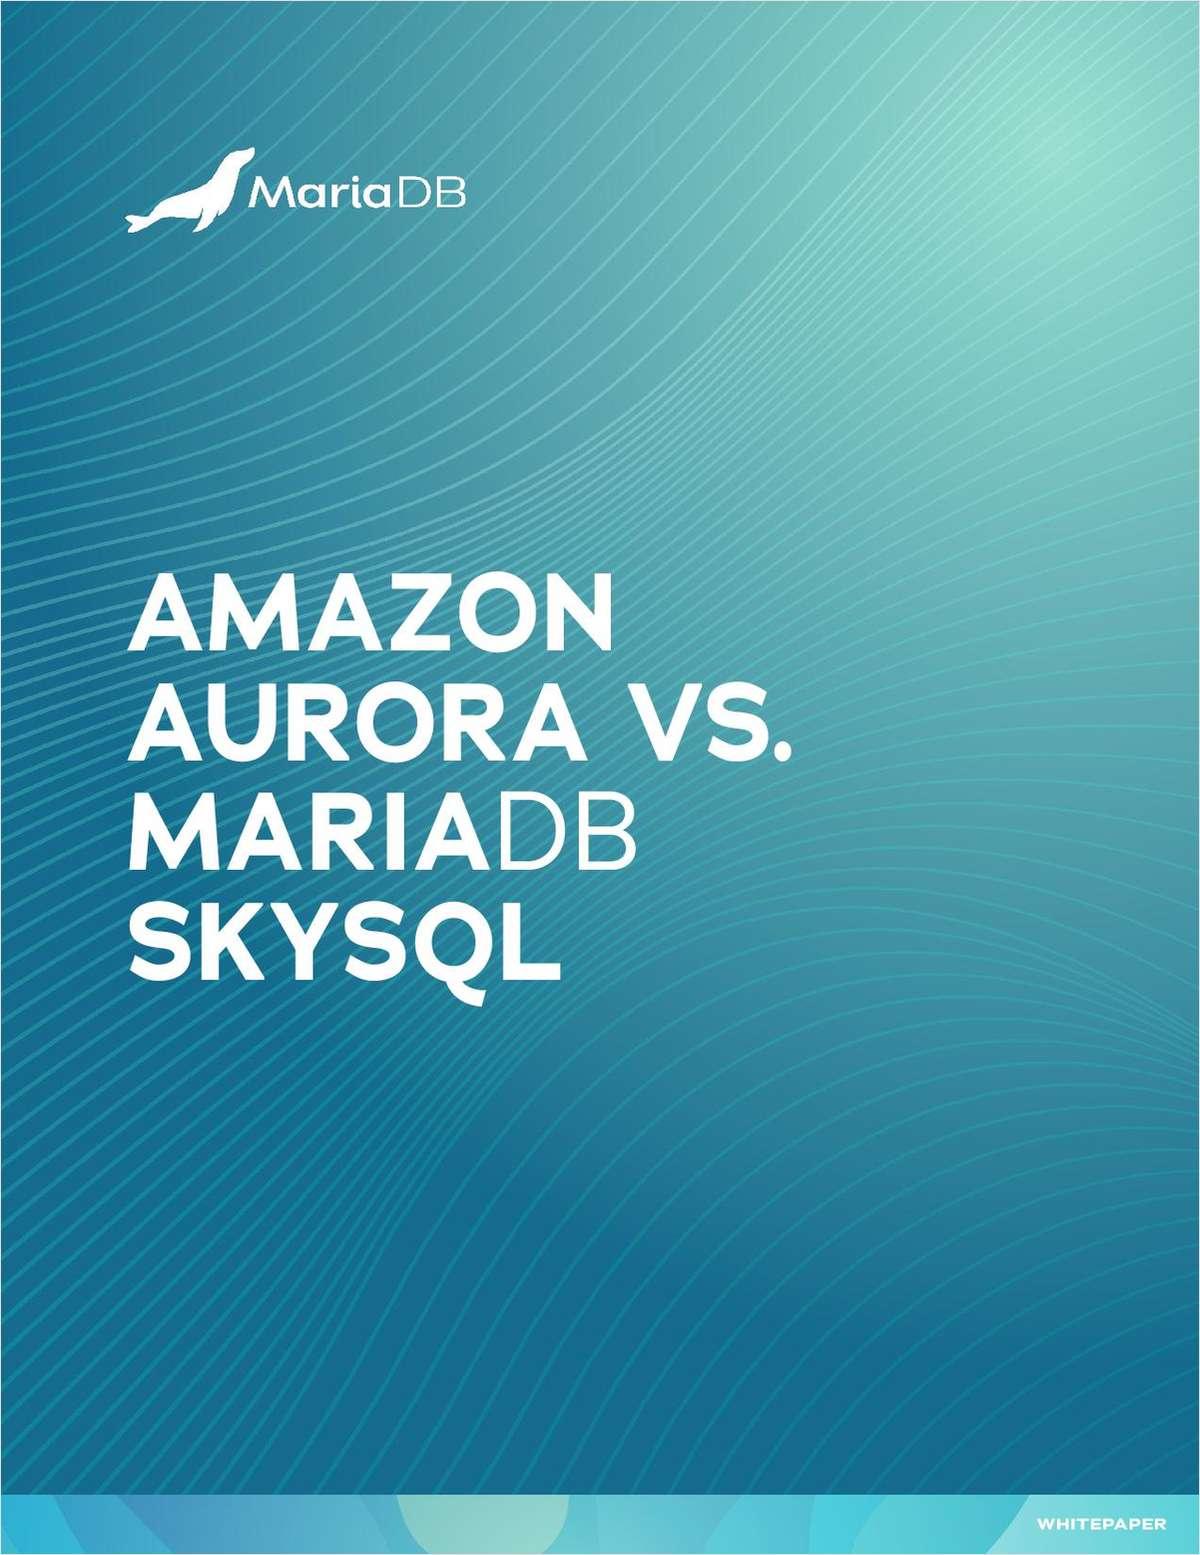 MariaDB SkySQL vs. Amazon Aurora